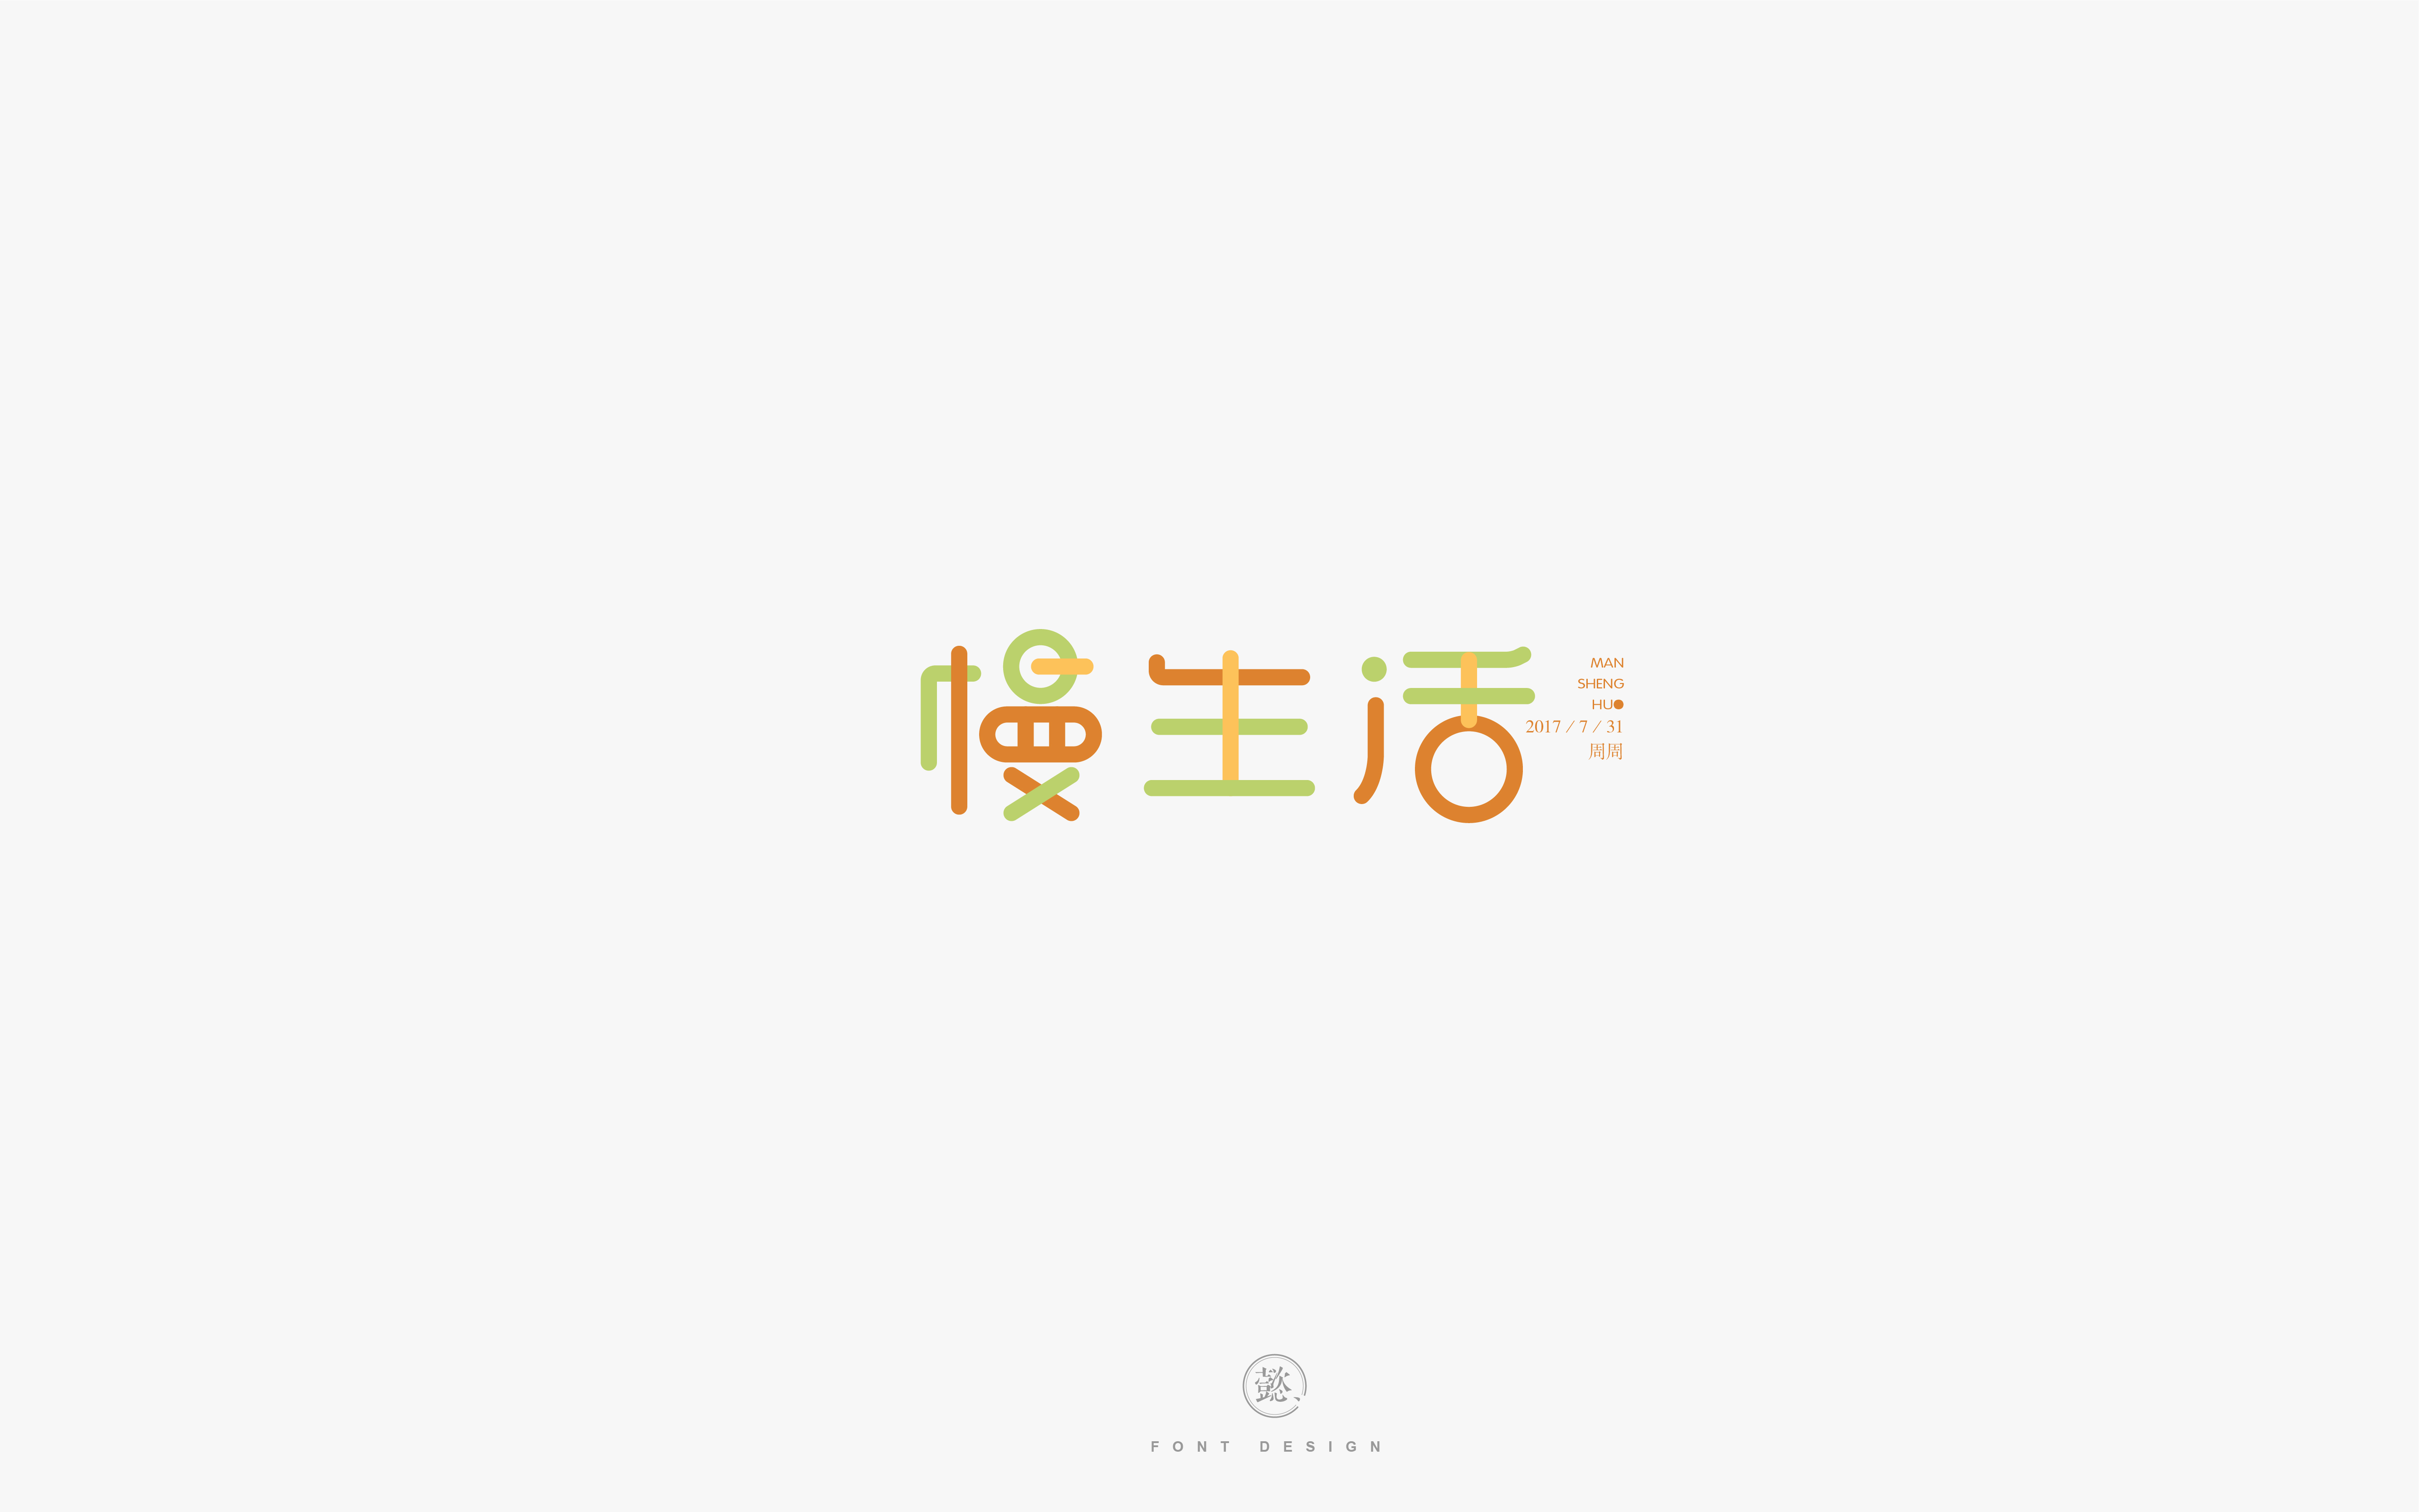 chinesefontdesign.com 2017 08 30 12 28 18 303351 15P Creative Chinese font logo design scheme #.6